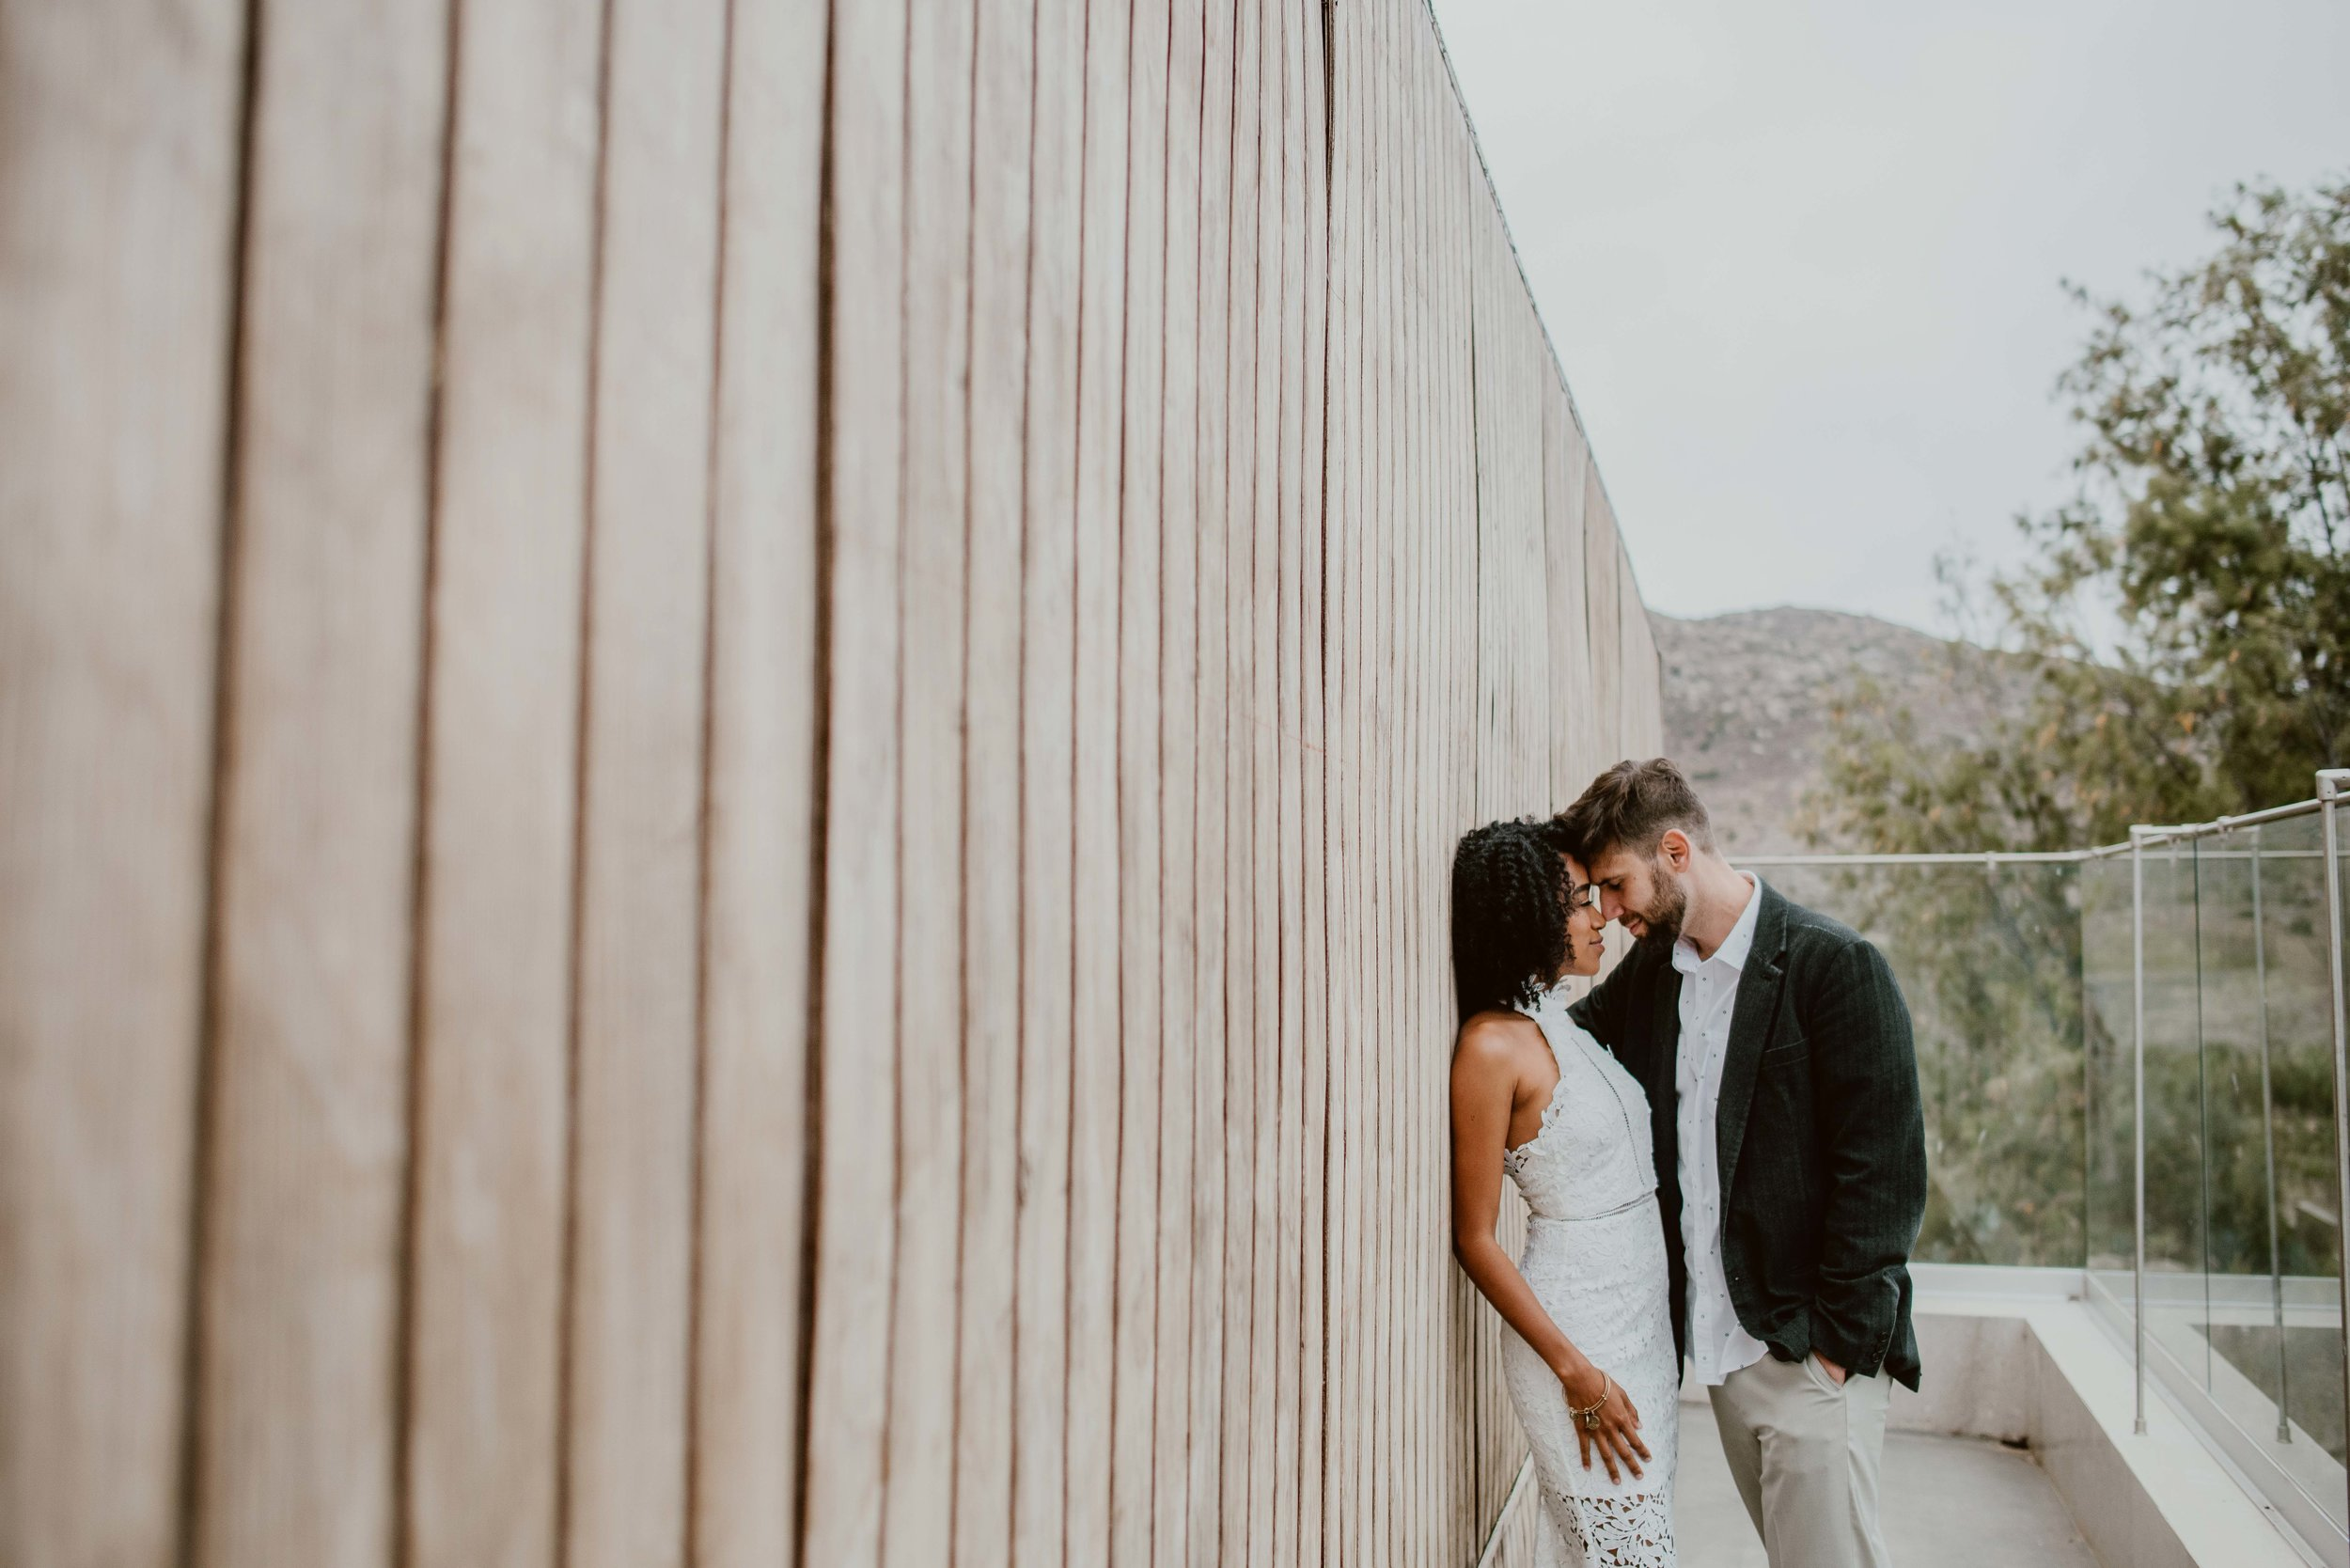 Nathalie+Carlin Engagement-16.jpg